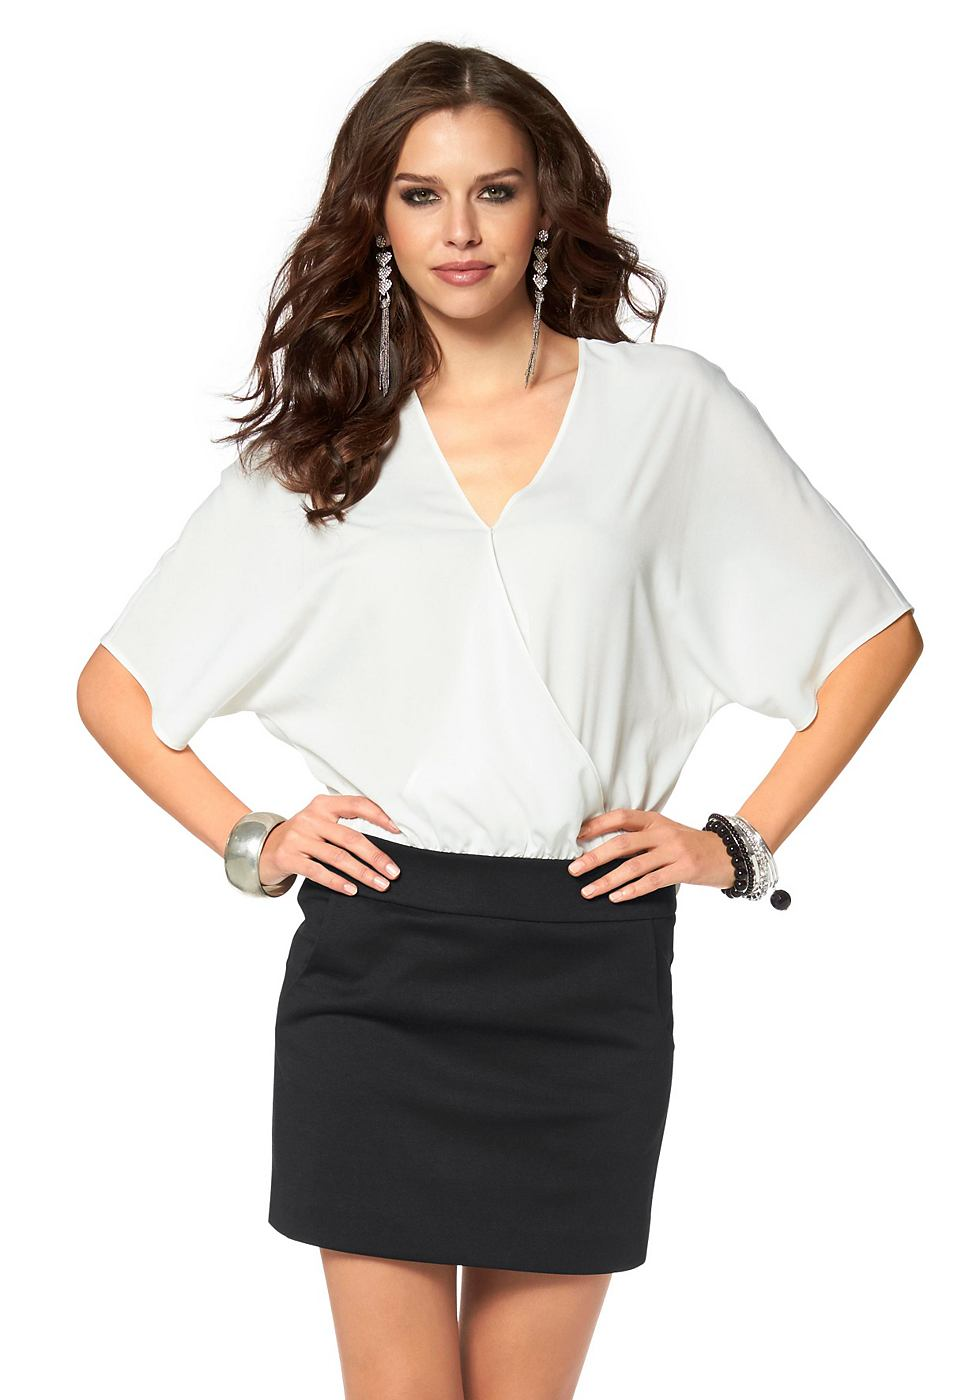 Laura Scott Shirt-jurk in 2-in-1-look zwart